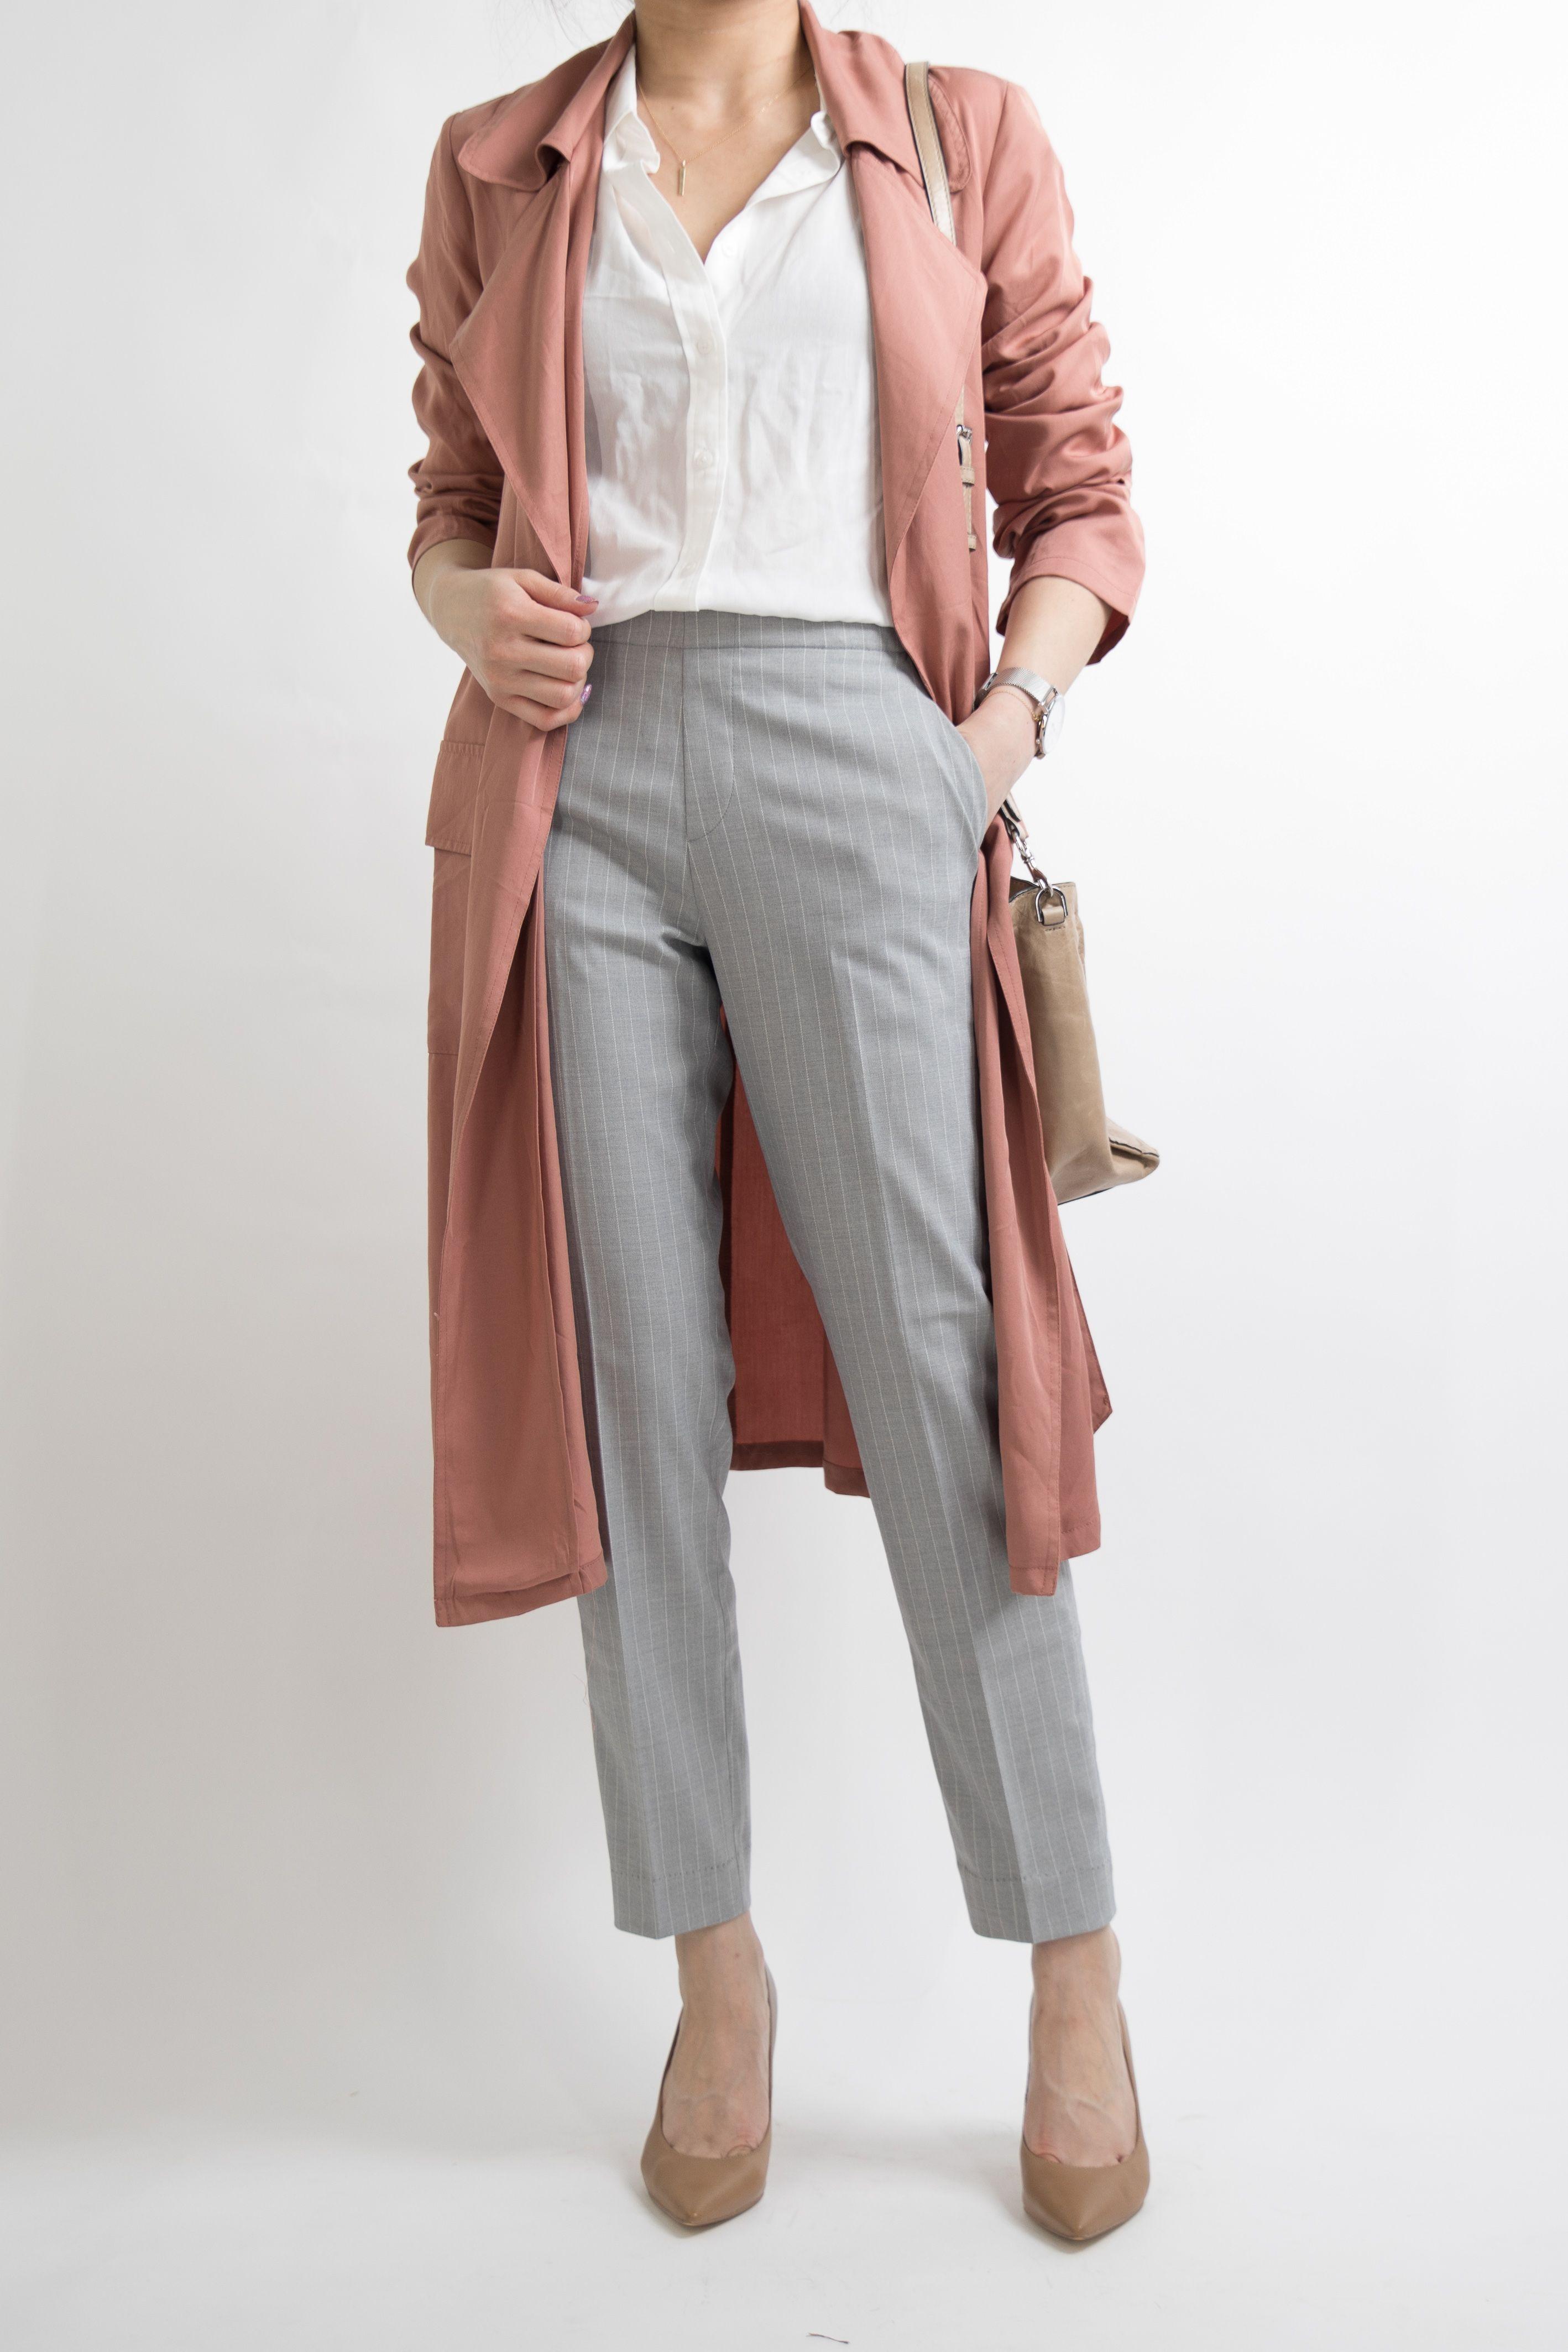 office wardrobe ideas. 1 MONTH OF WORK OFFICE OUTFIT IDEAS - Miss Louie Office Wardrobe Ideas F